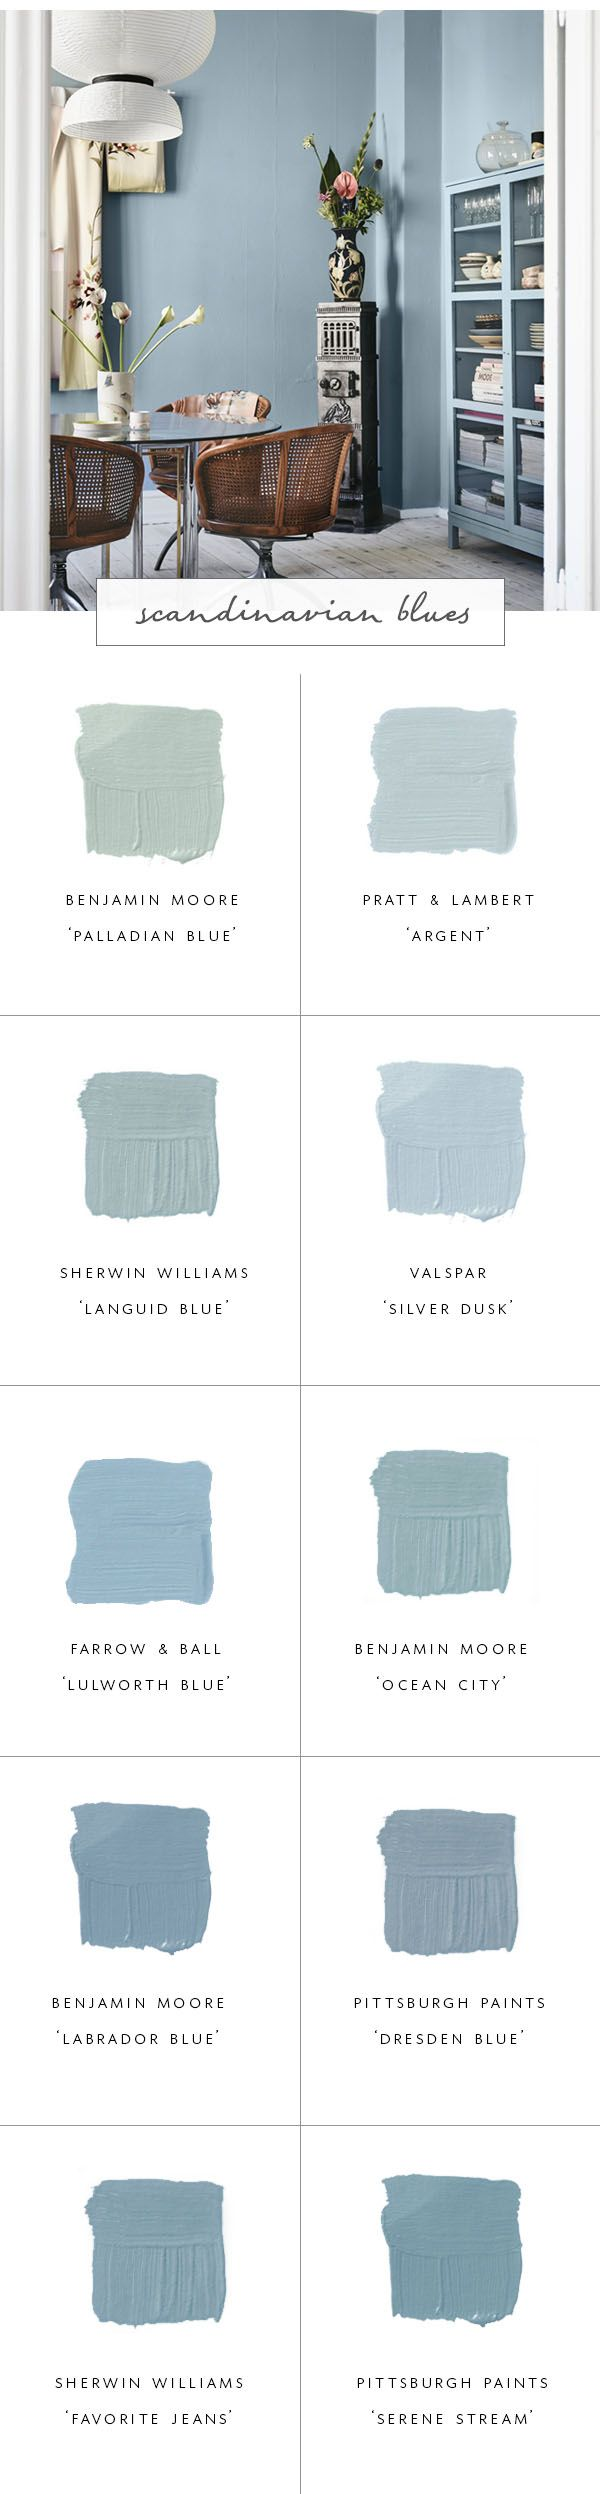 10 Perfect Scandinavian Blue Paint Colors For Your Home Coco Kelley Blue Paint Colors Scandinavian Style Home Bedroom Scandinavian Style